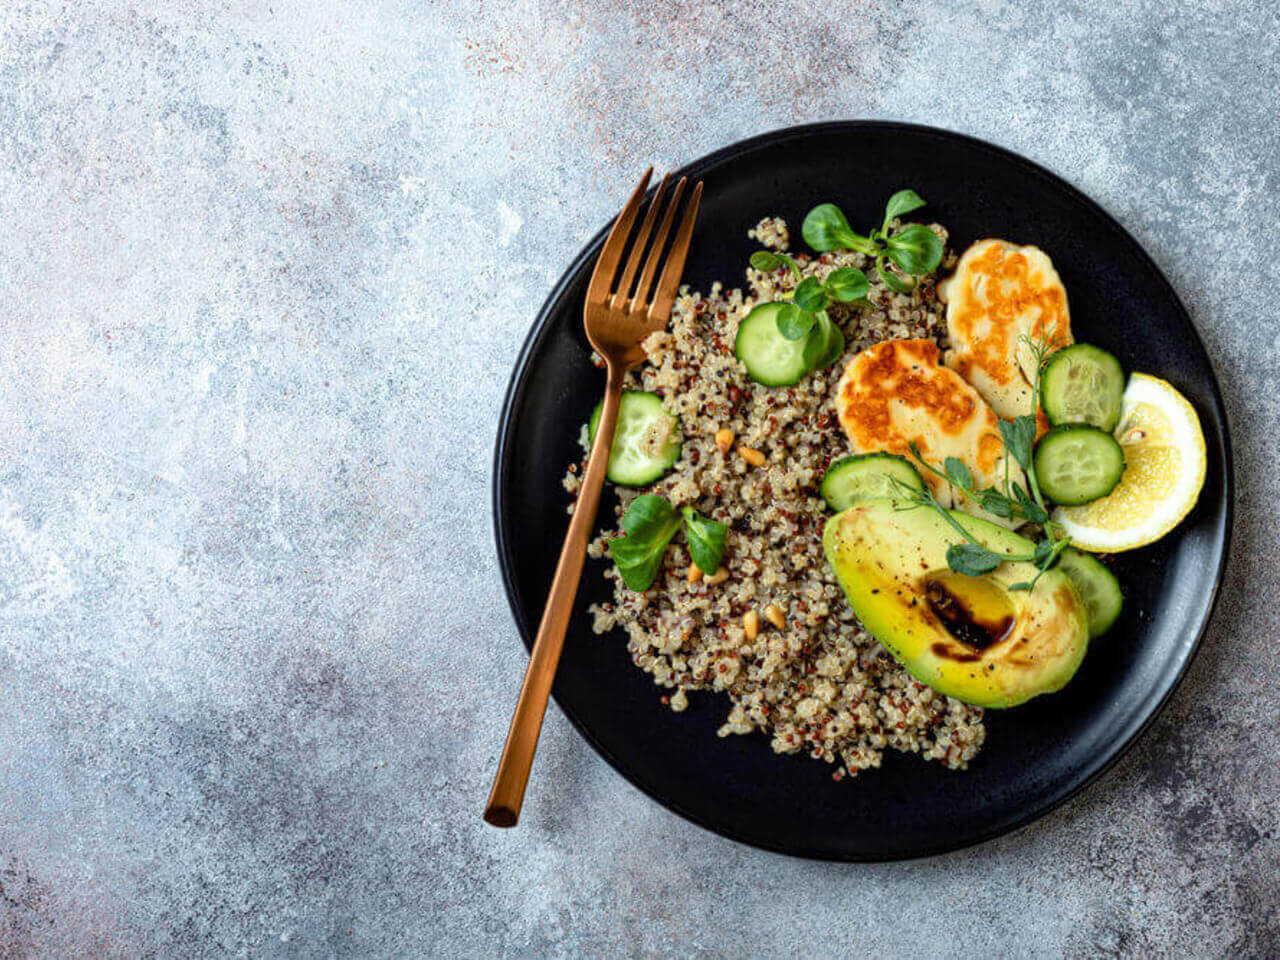 Teplý salát z quinoy s praženými piniovými oříšky a sýrem halloumi